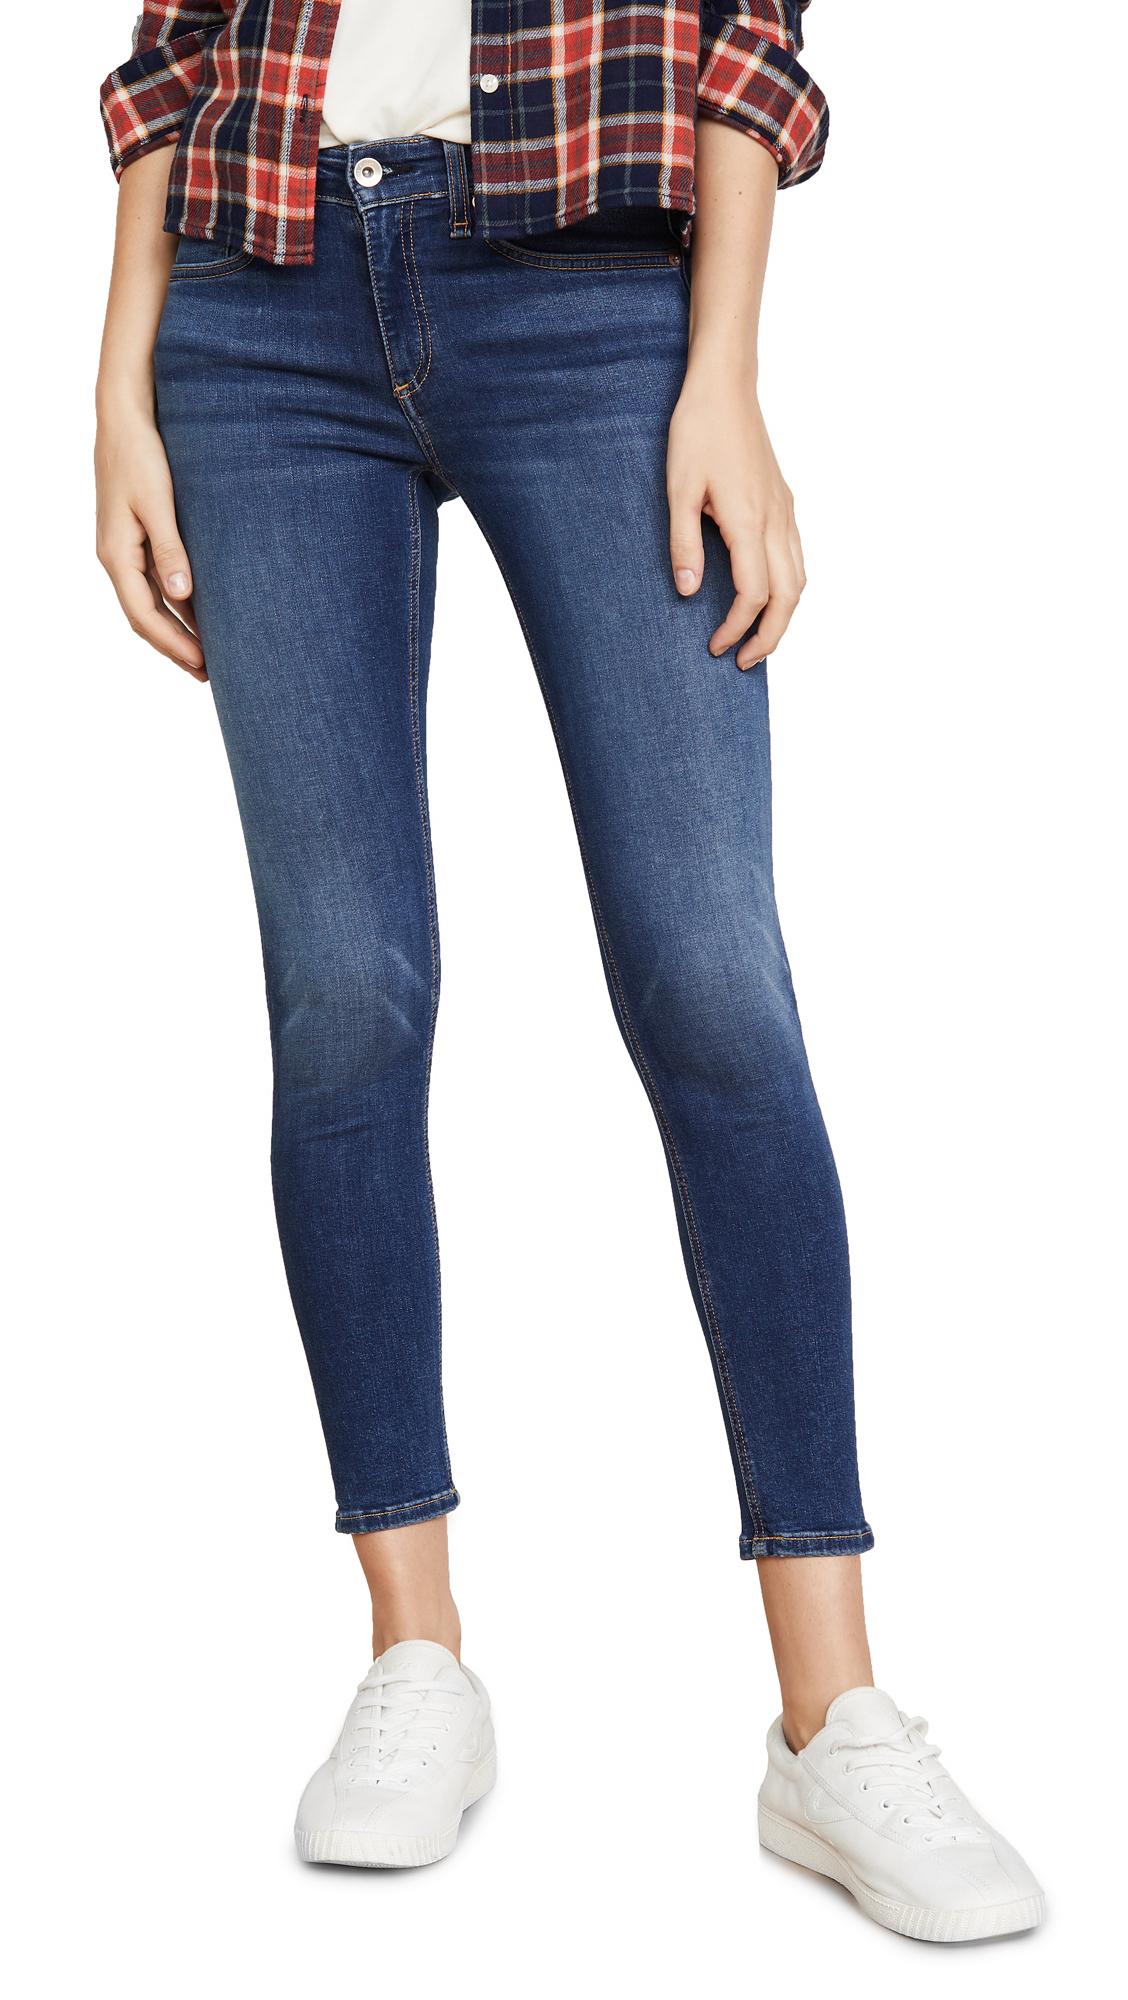 Buy Rag & Bone/JEAN online - photo of Rag & Bone/JEAN Cate Mid Rise Skinny Ankle Jeans